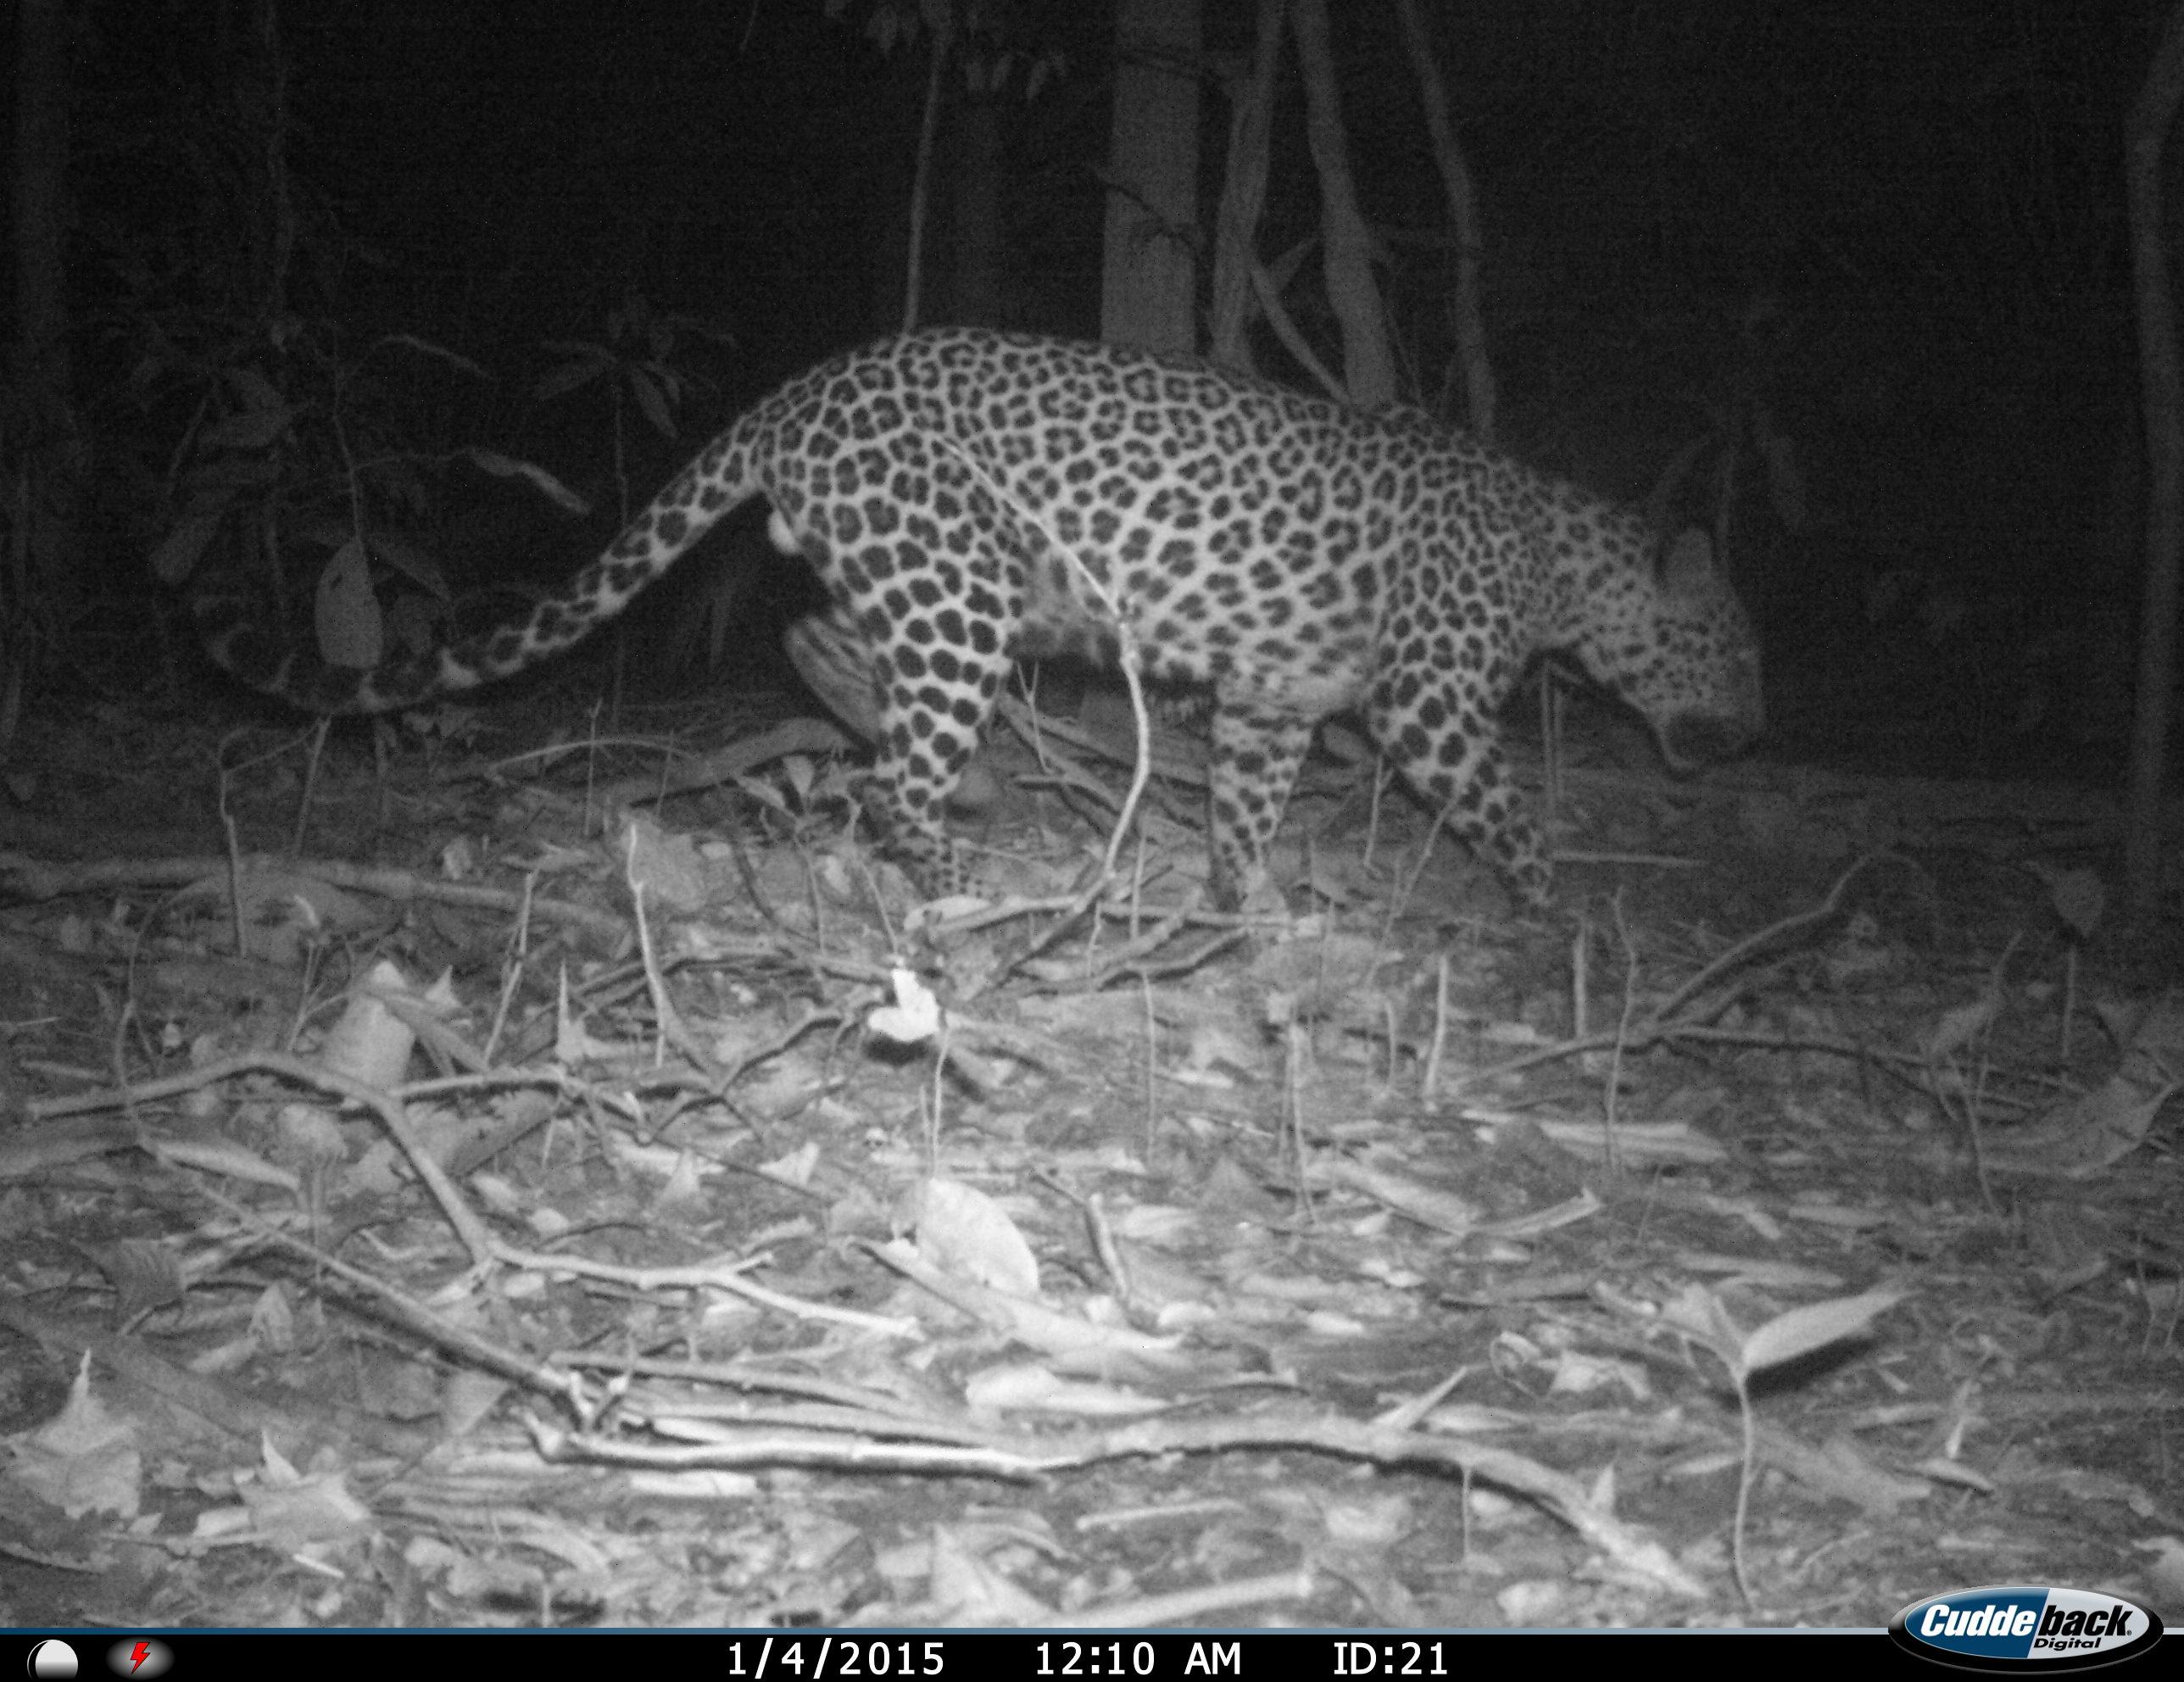 Malay leopard